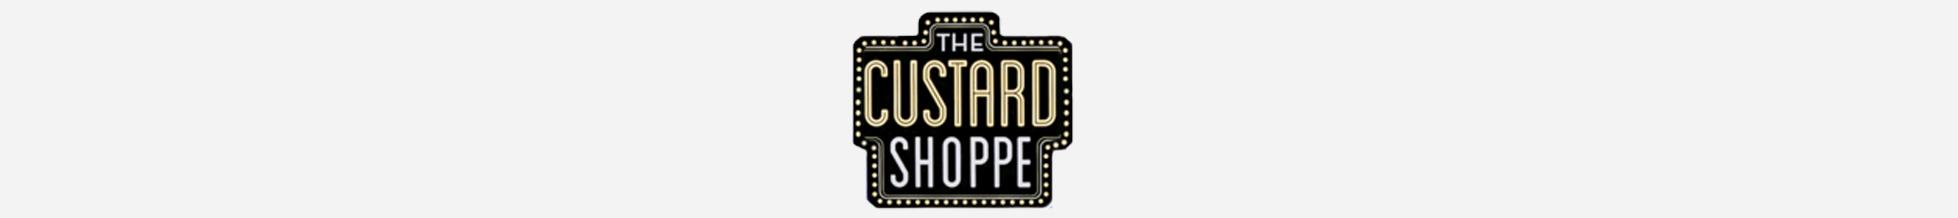 the-custard-shoppe.jpg